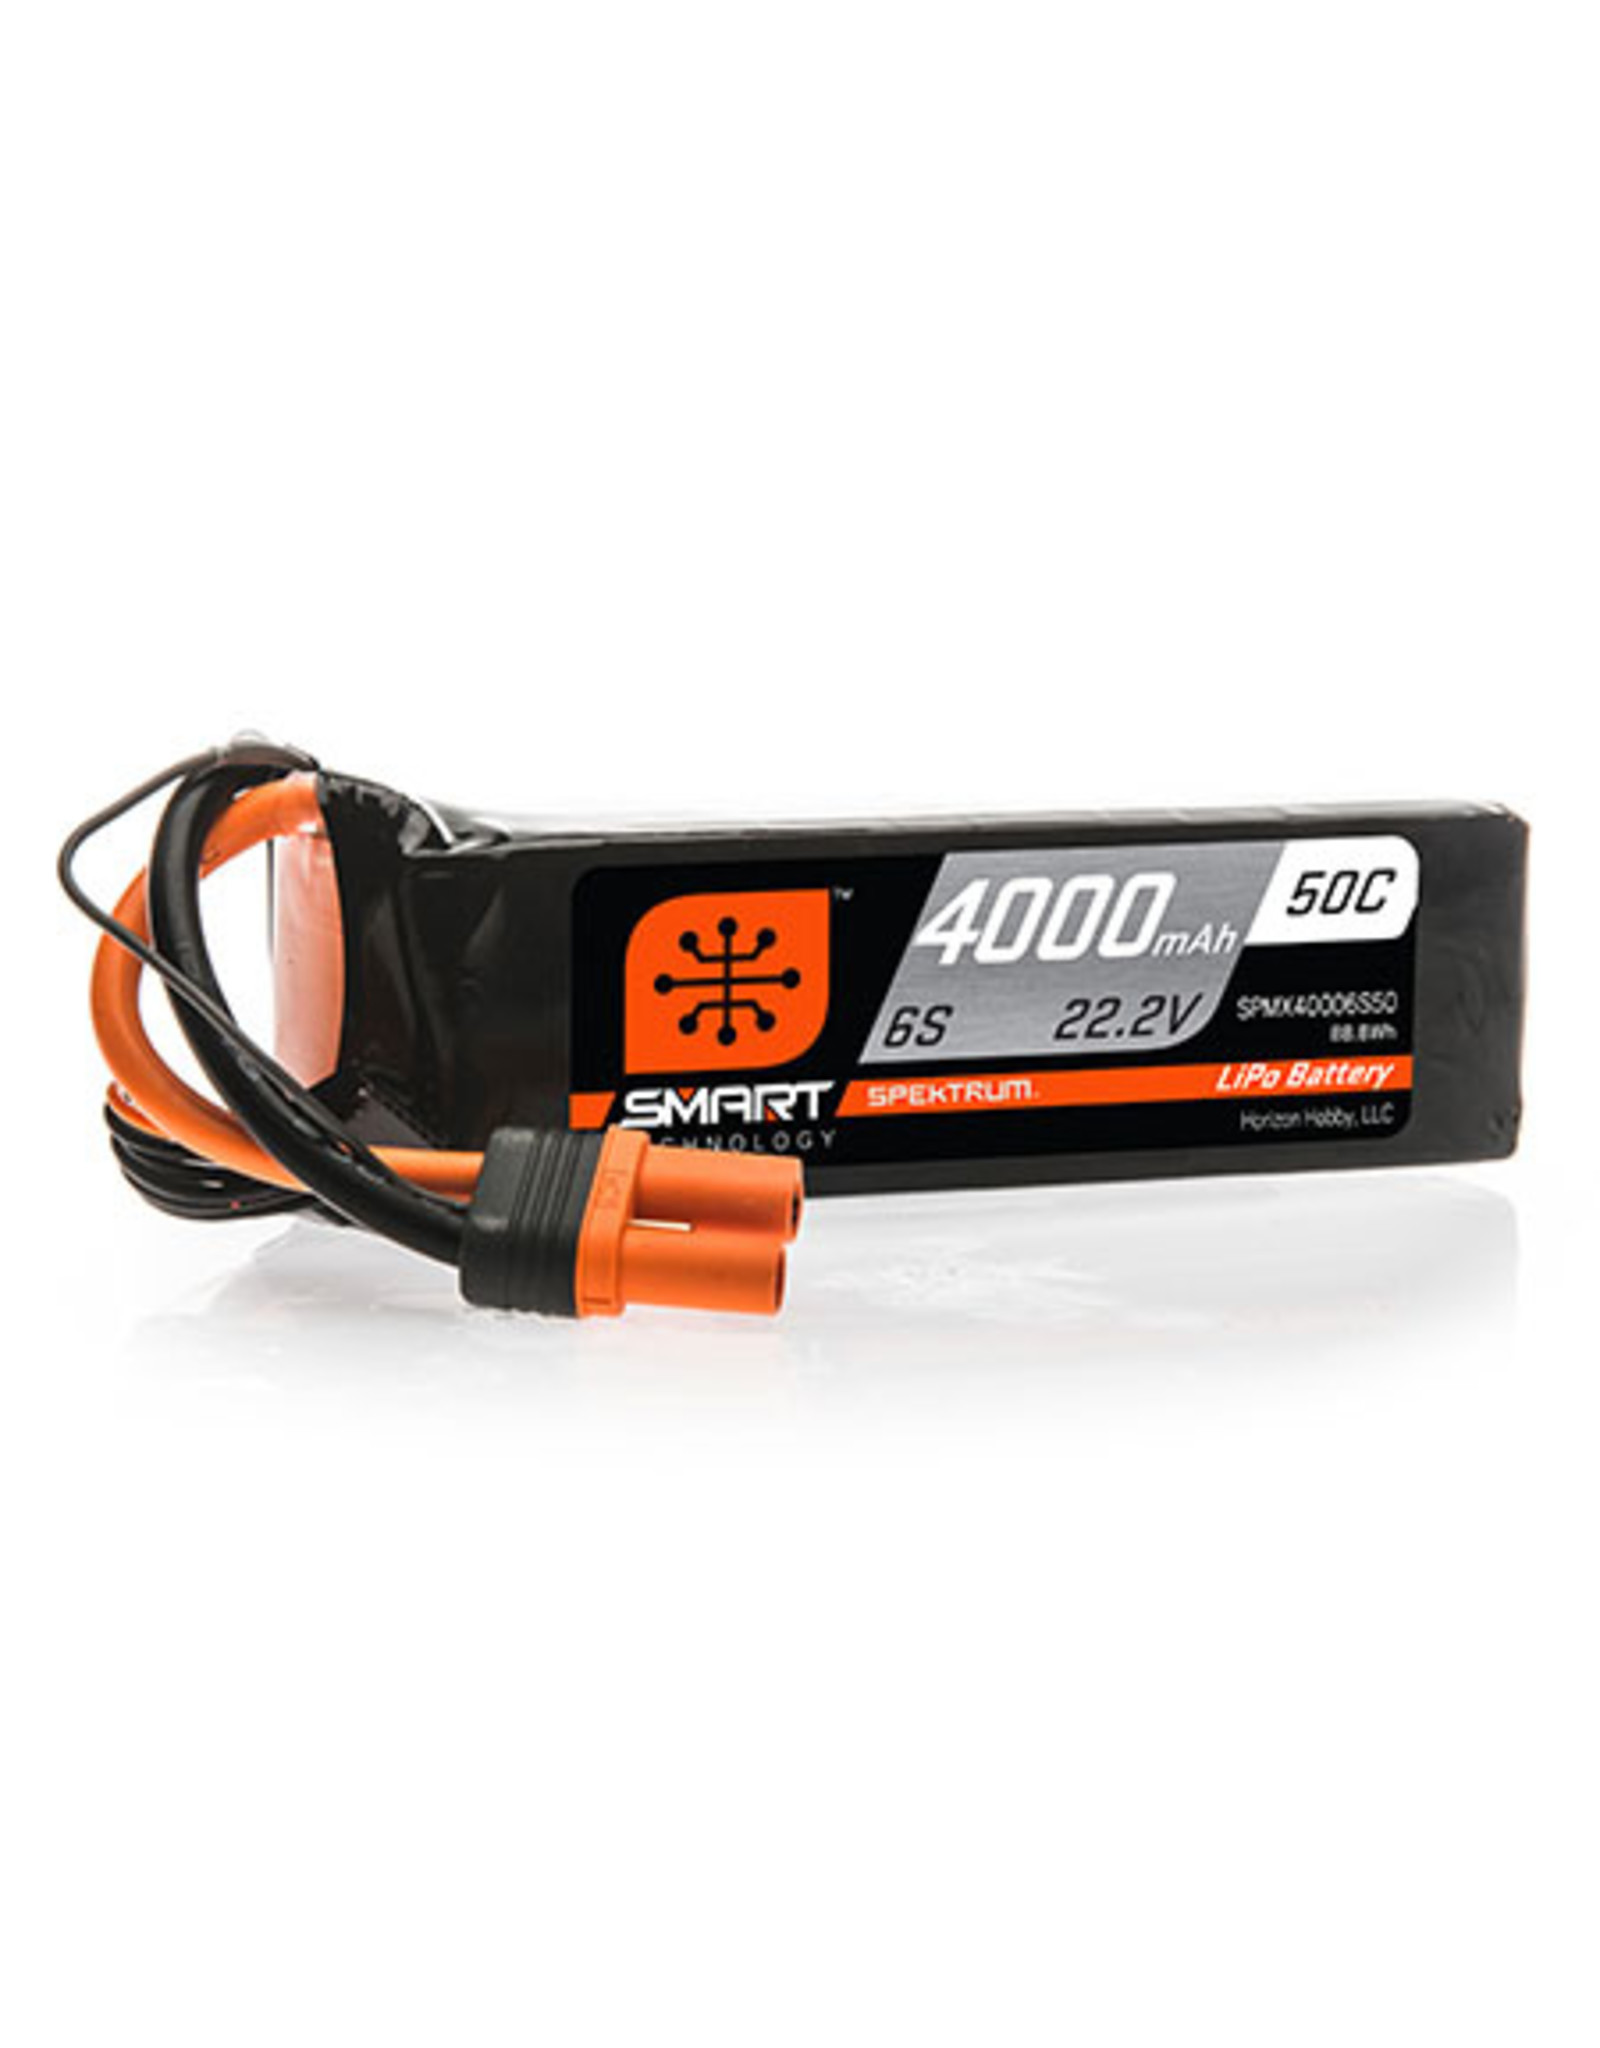 Spektrum 4000mAh 6S 22.2V 50C Smart LiPo Battery; IC5 (SPMX40006S50)